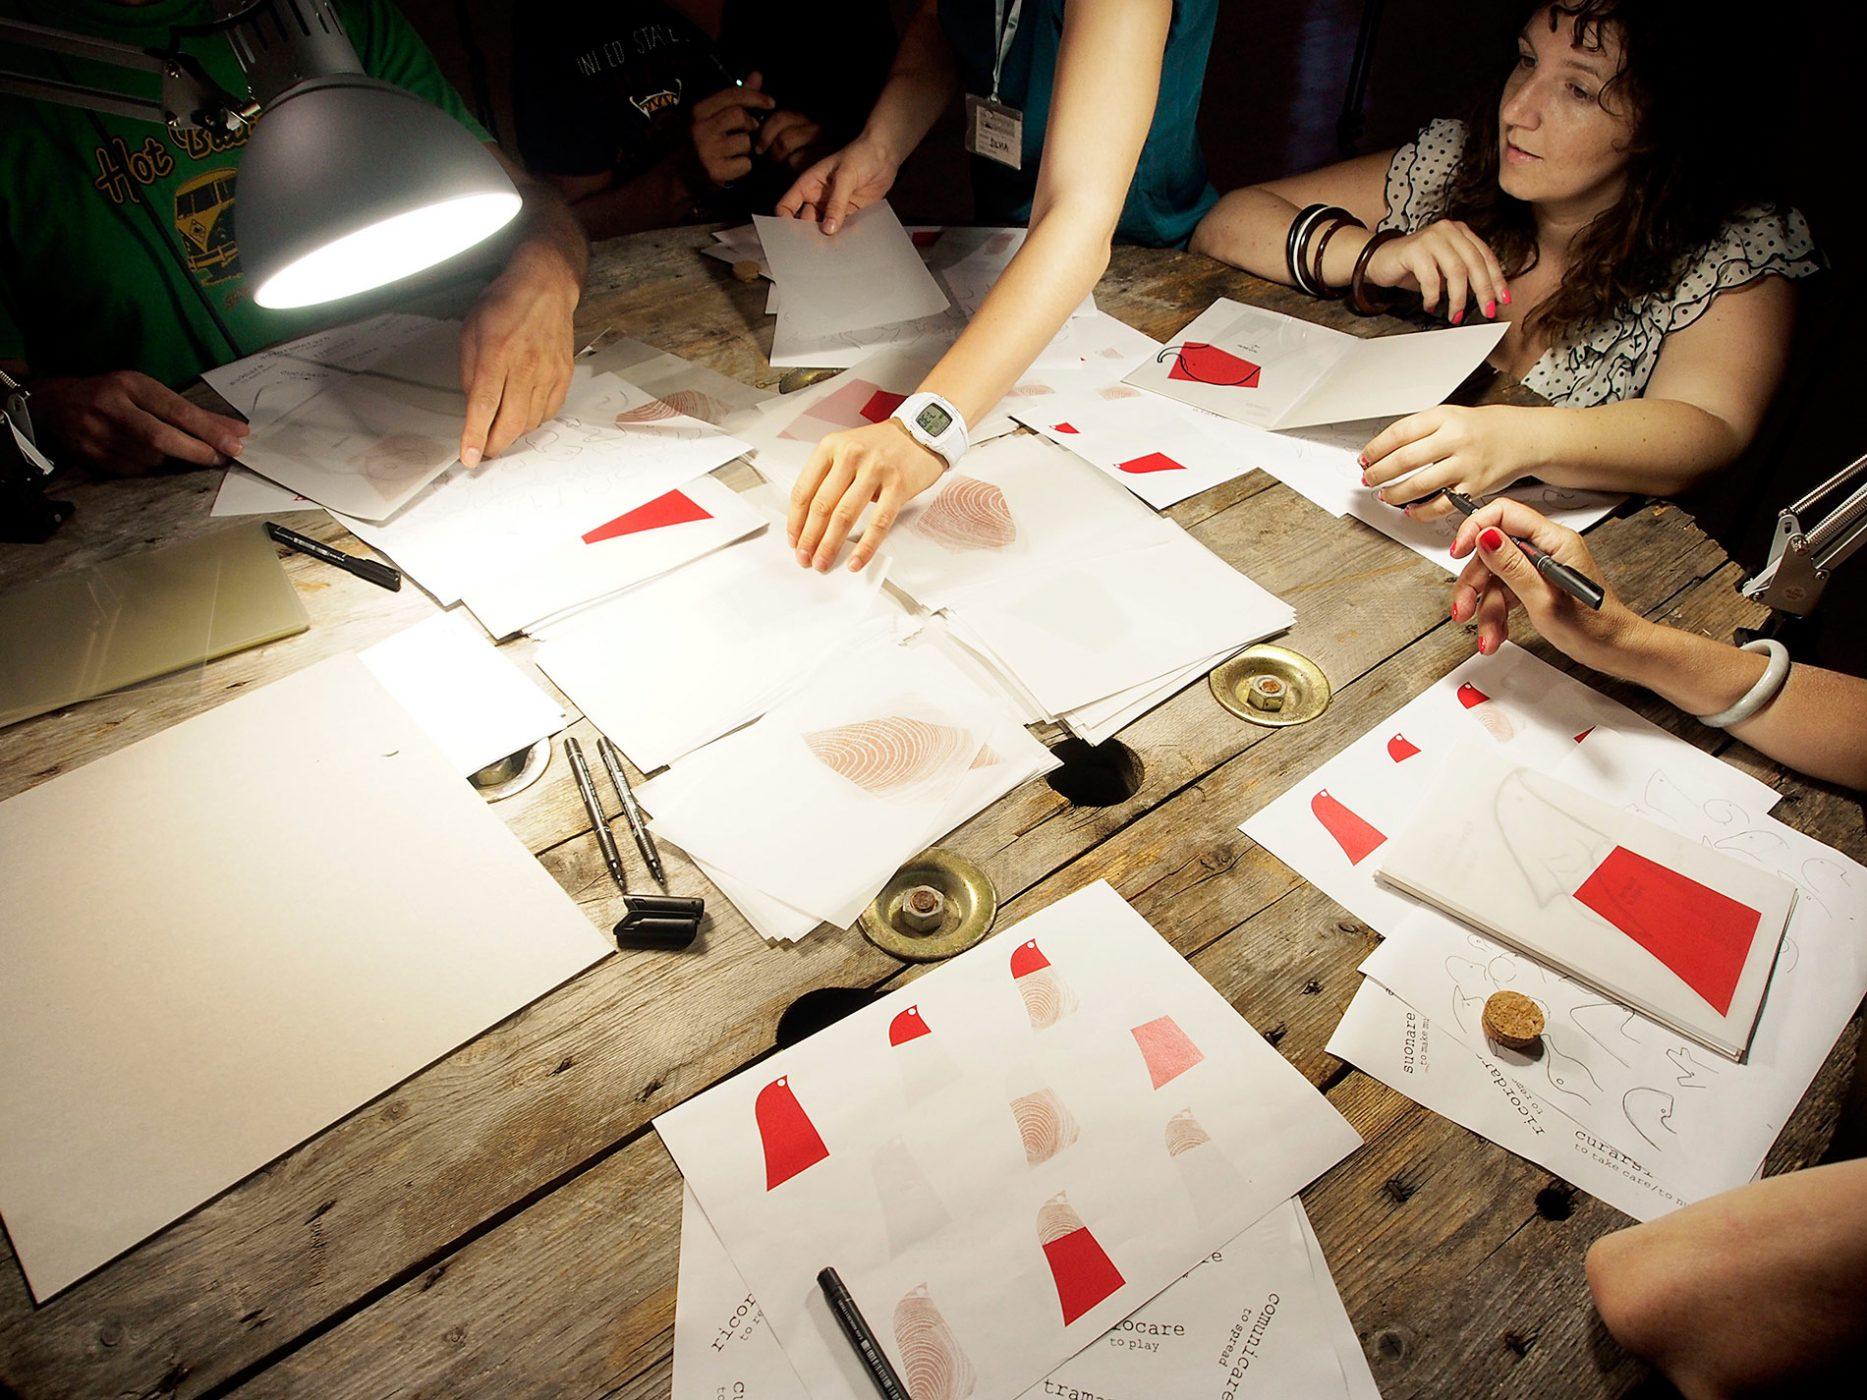 participative design in white noise machine by Mali Weil